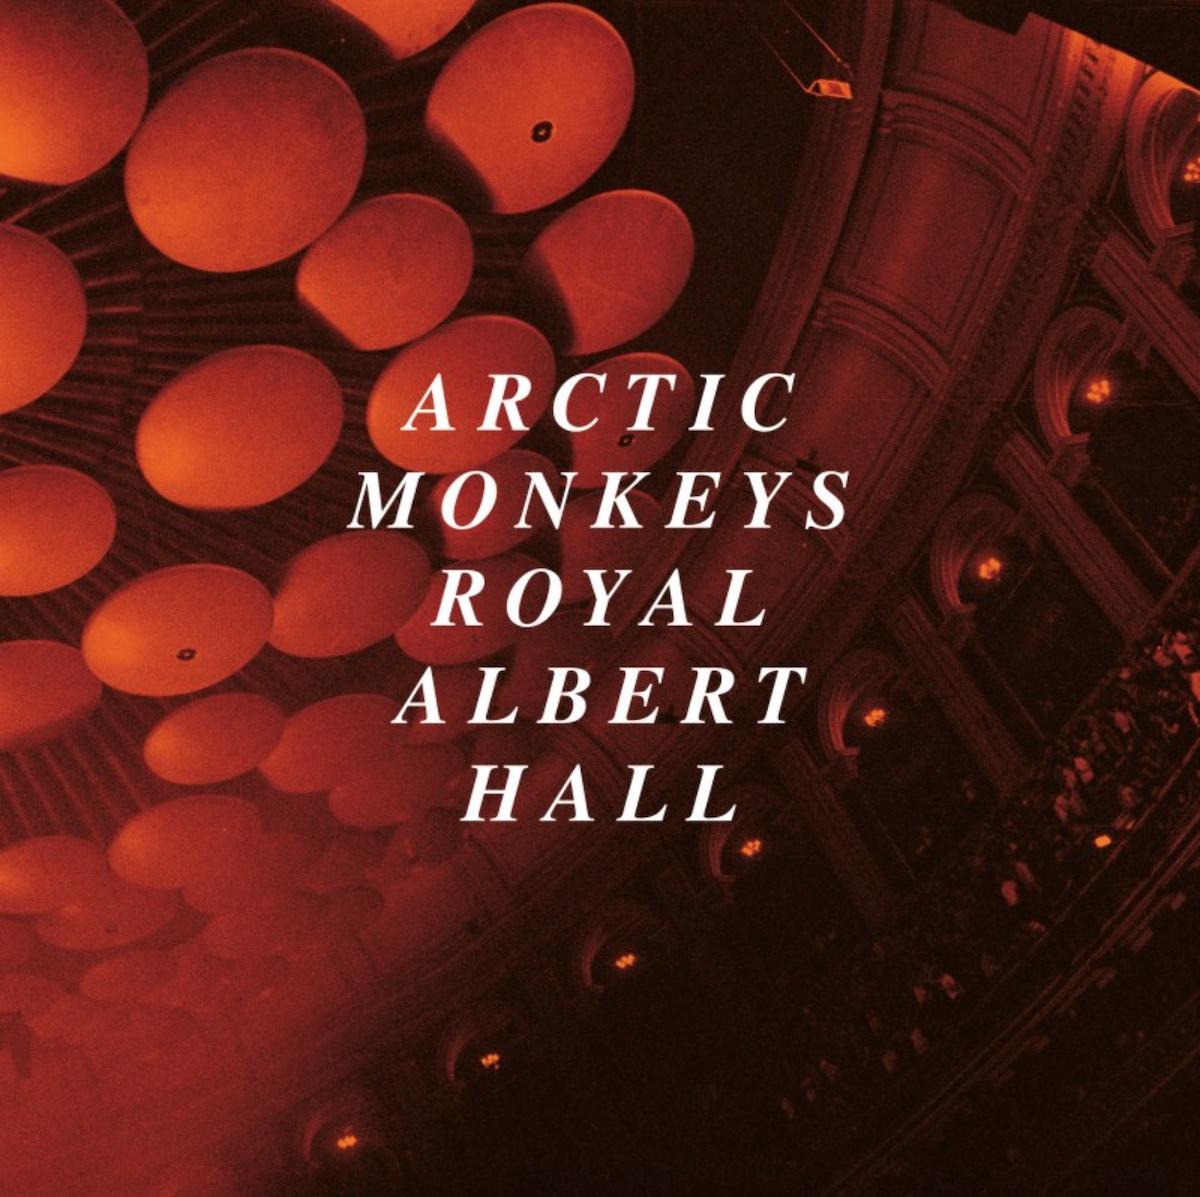 Arctic Monkeys – Live At The Royal Albert Hall album cover artwork